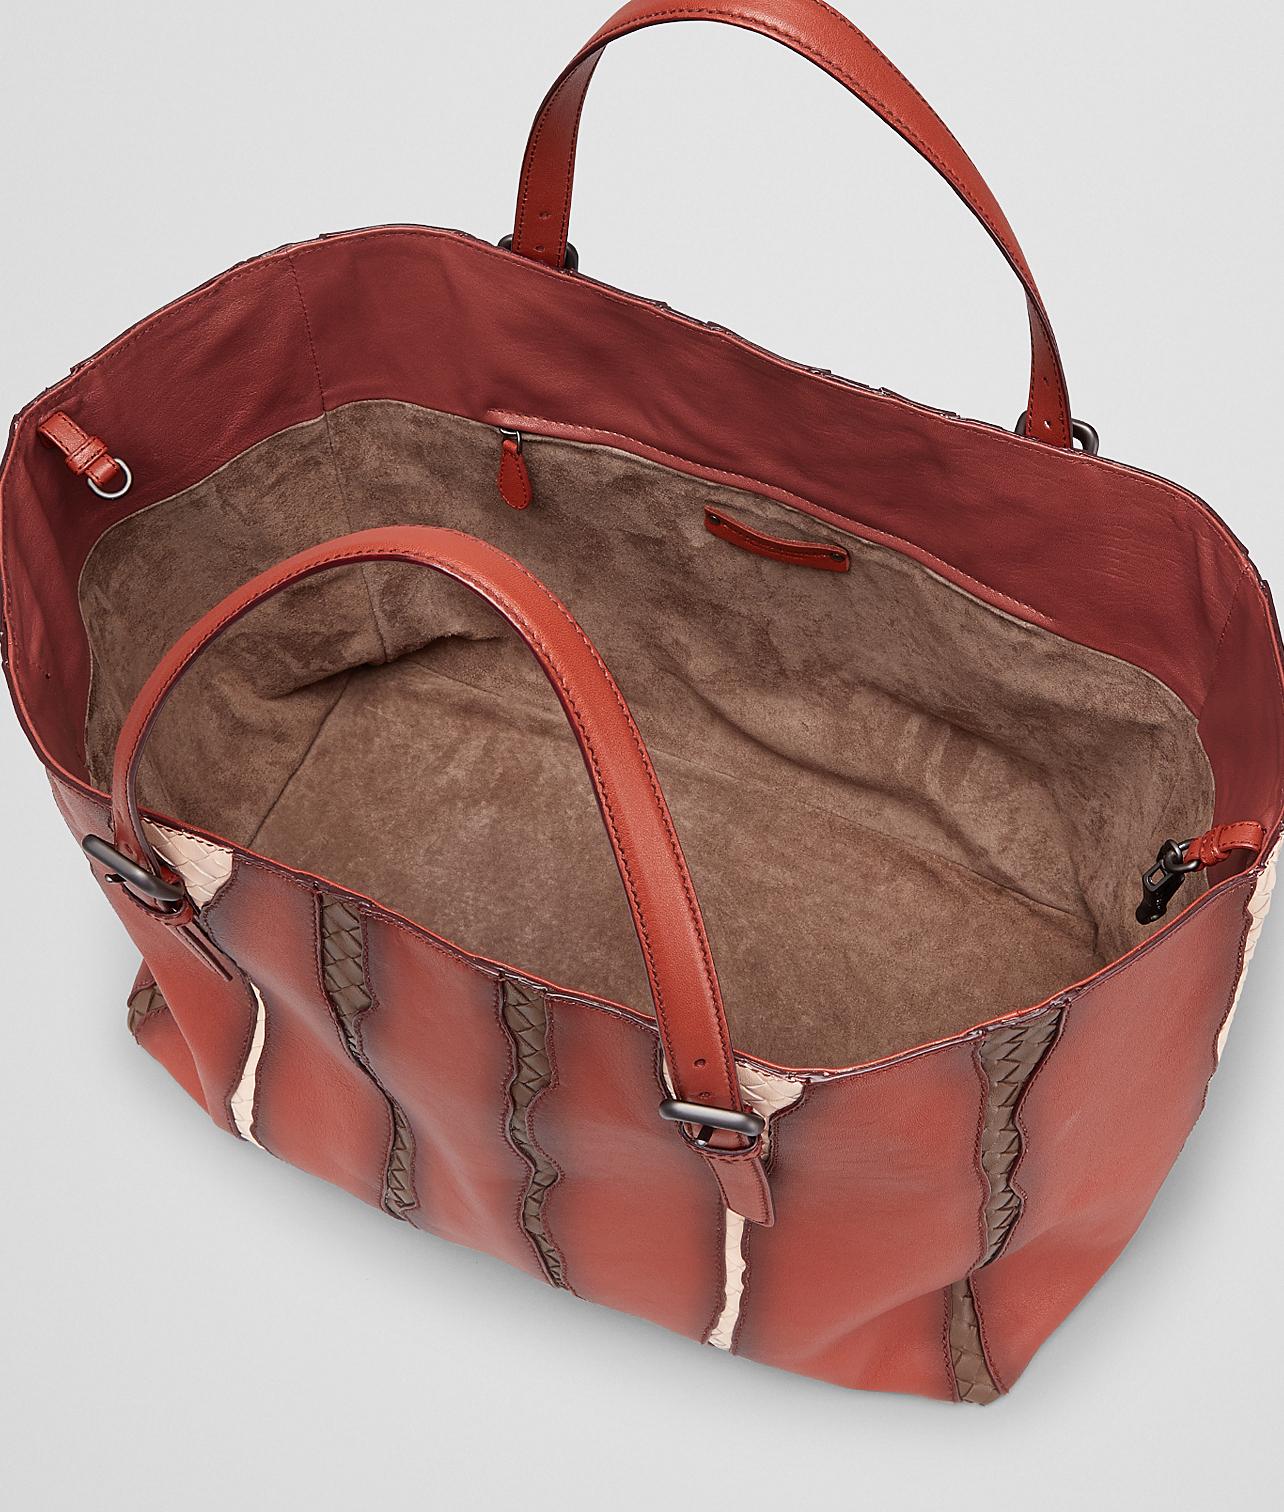 a60ac3b98 Bottega Veneta Burnt Red Washed Nappa Intrecciato Glimmer Tote Bag ...